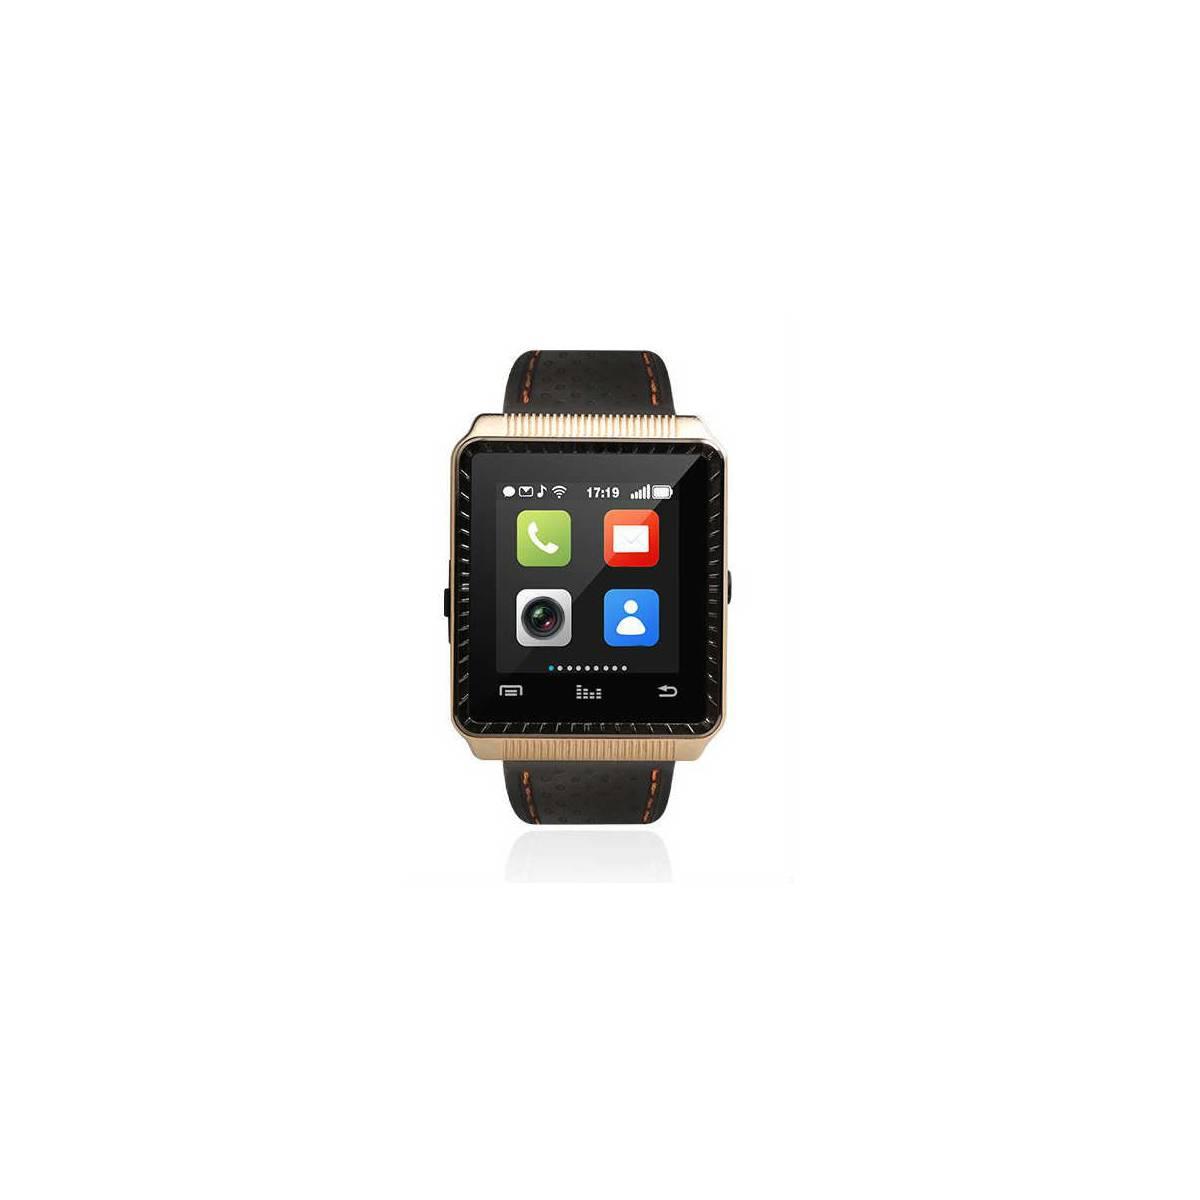 Smart Watch Akıllı Saat İnceleme Smart Watch Akıllı Saat İnceleme 187694717 tn120 0